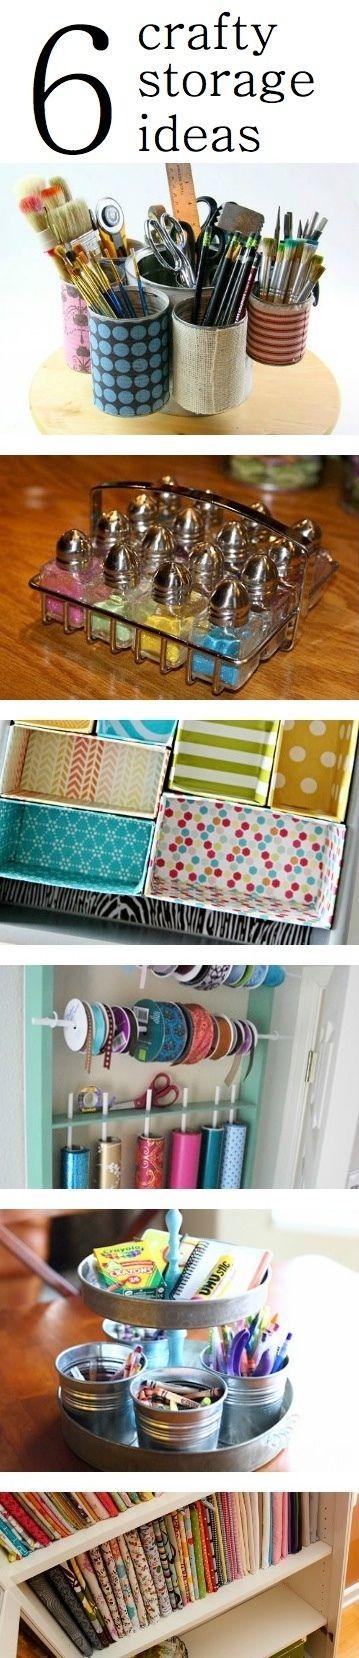 Craft Supply Organizing Ideas